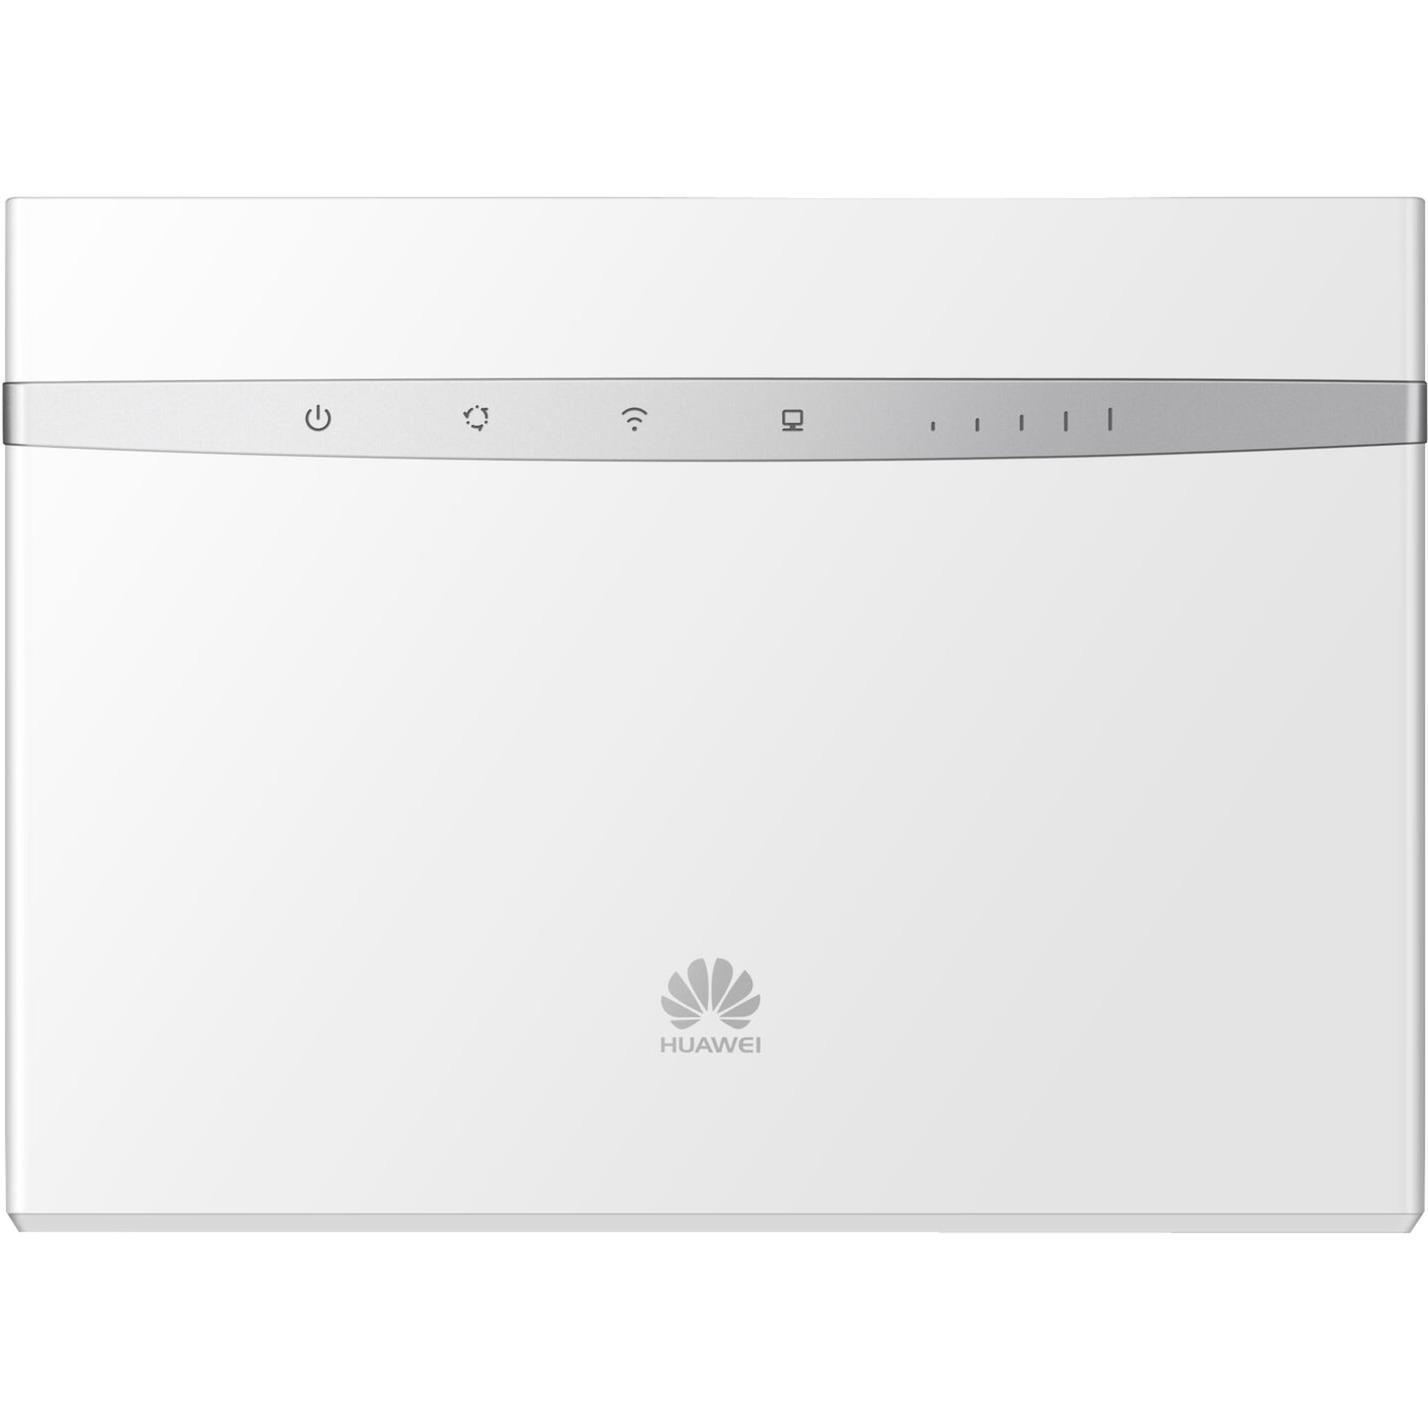 B525 Bi-bande (2,4 GHz / 5 GHz) Gigabit Ethernet 3G 4G Blanc routeur sans fil